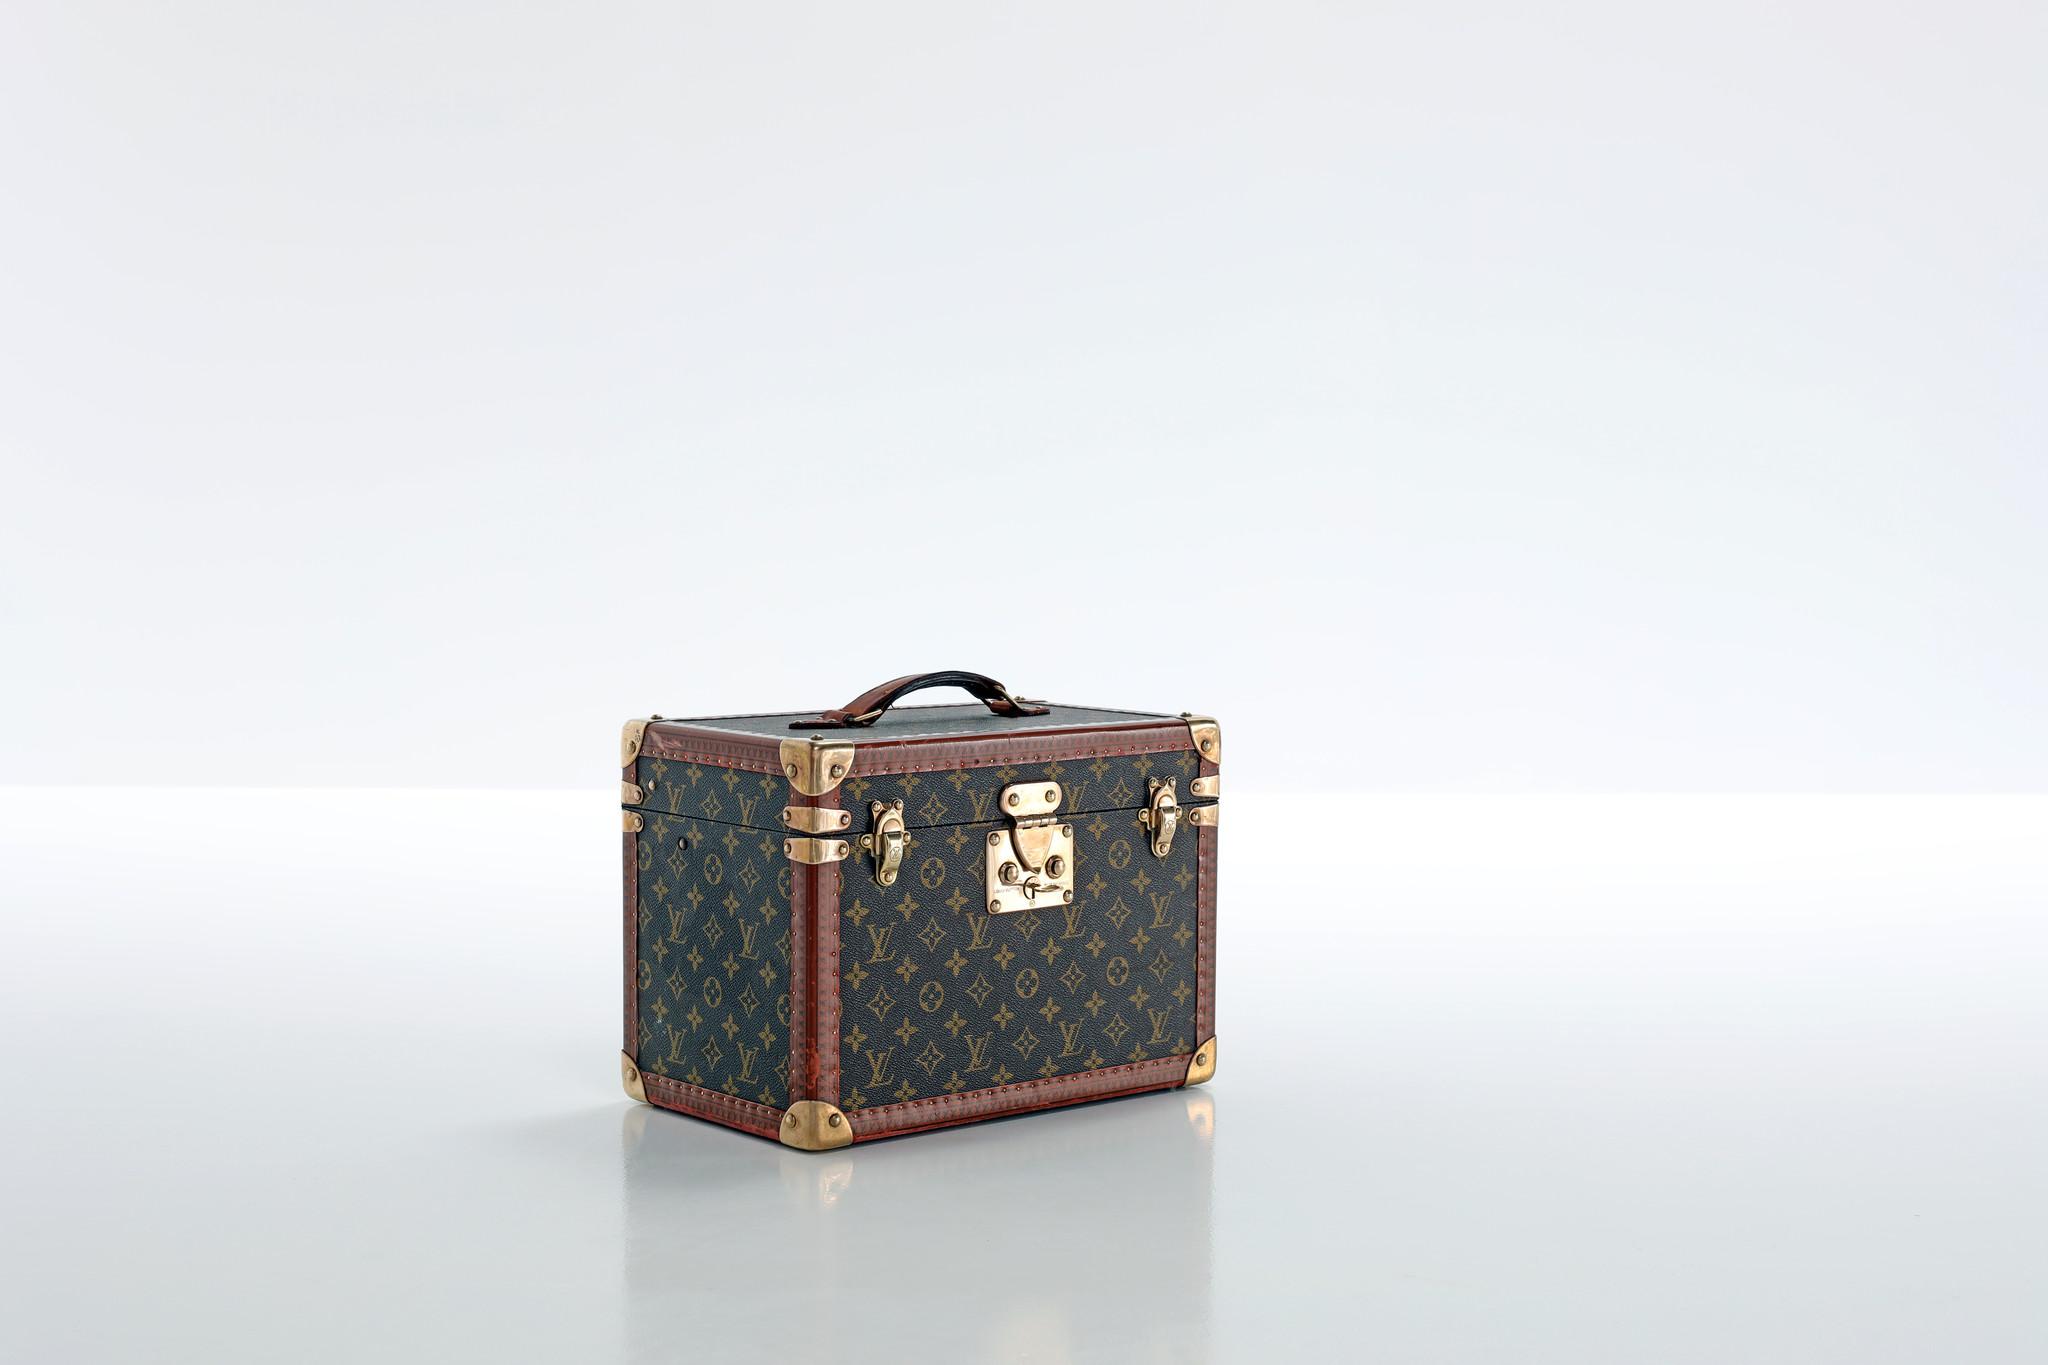 Beautycase Louis Vuitton monogram